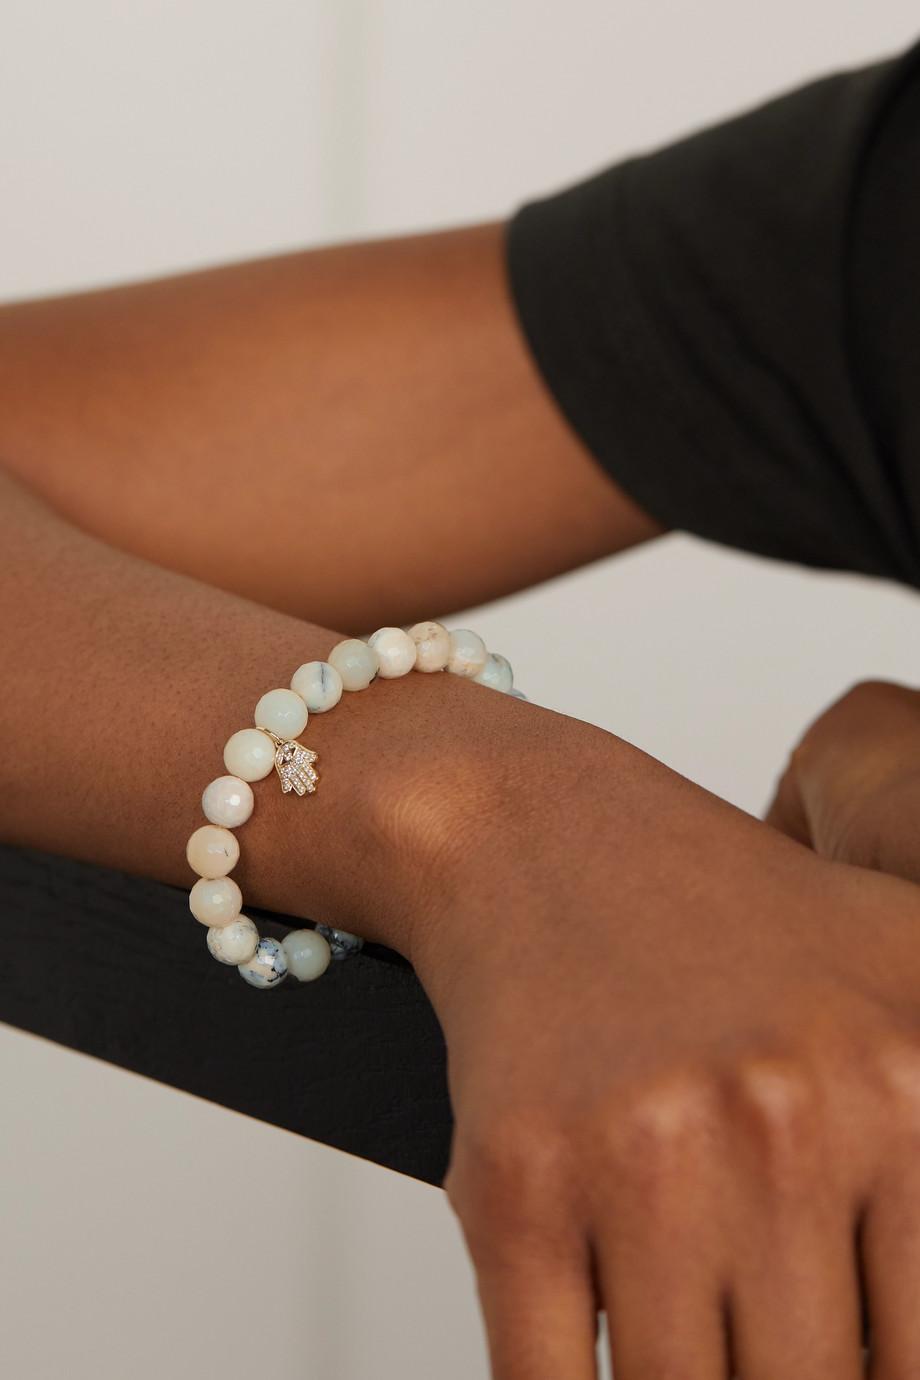 Sydney Evan Hamsa 14-karat gold, opal and diamond bracelet